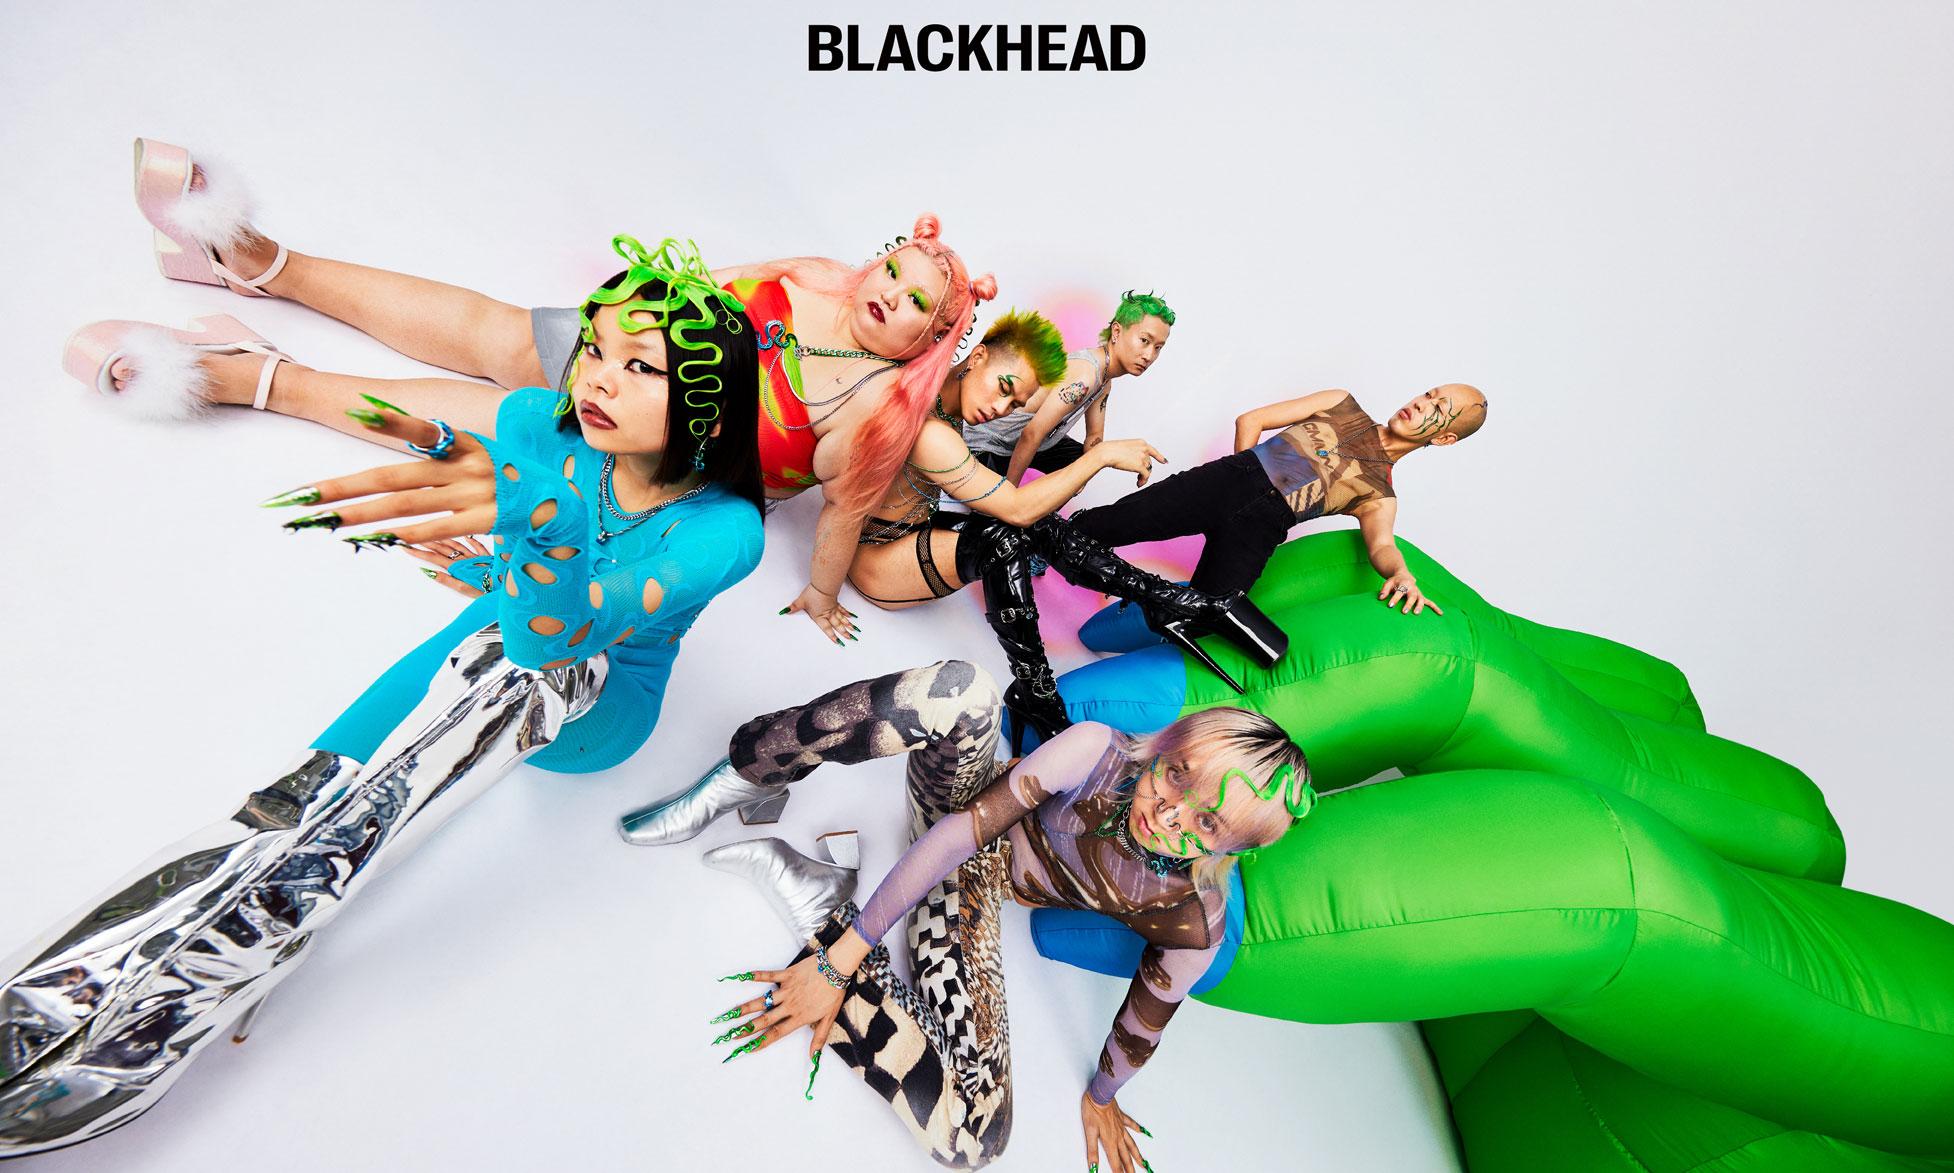 BLACKHEAD 发布「Neon Jungle」系列新品